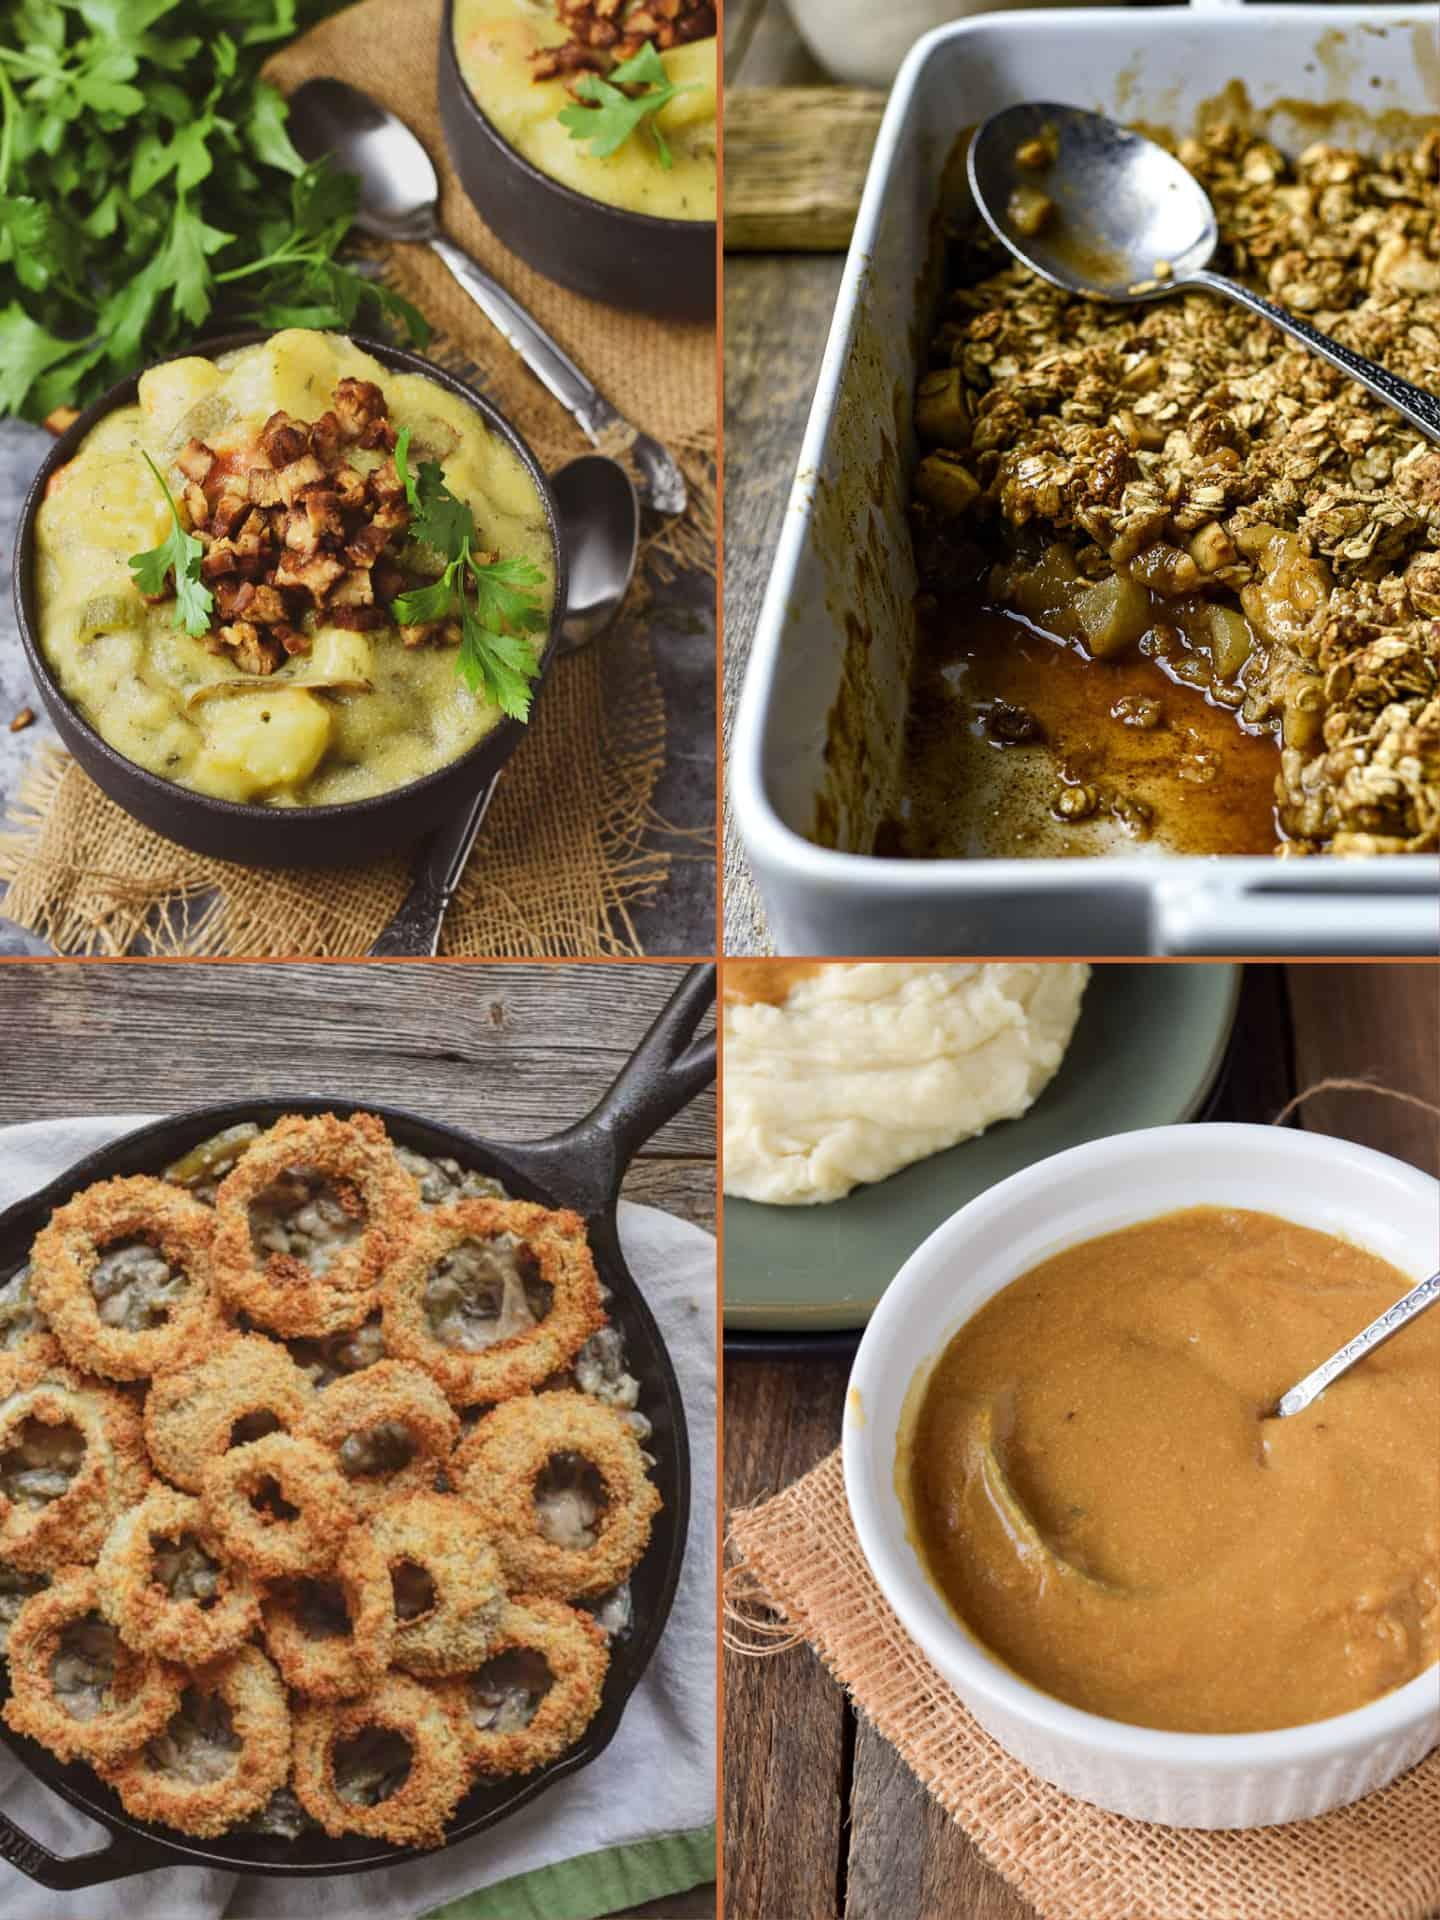 Potato soup, apples crips, green bean casserole, and gravy picture.